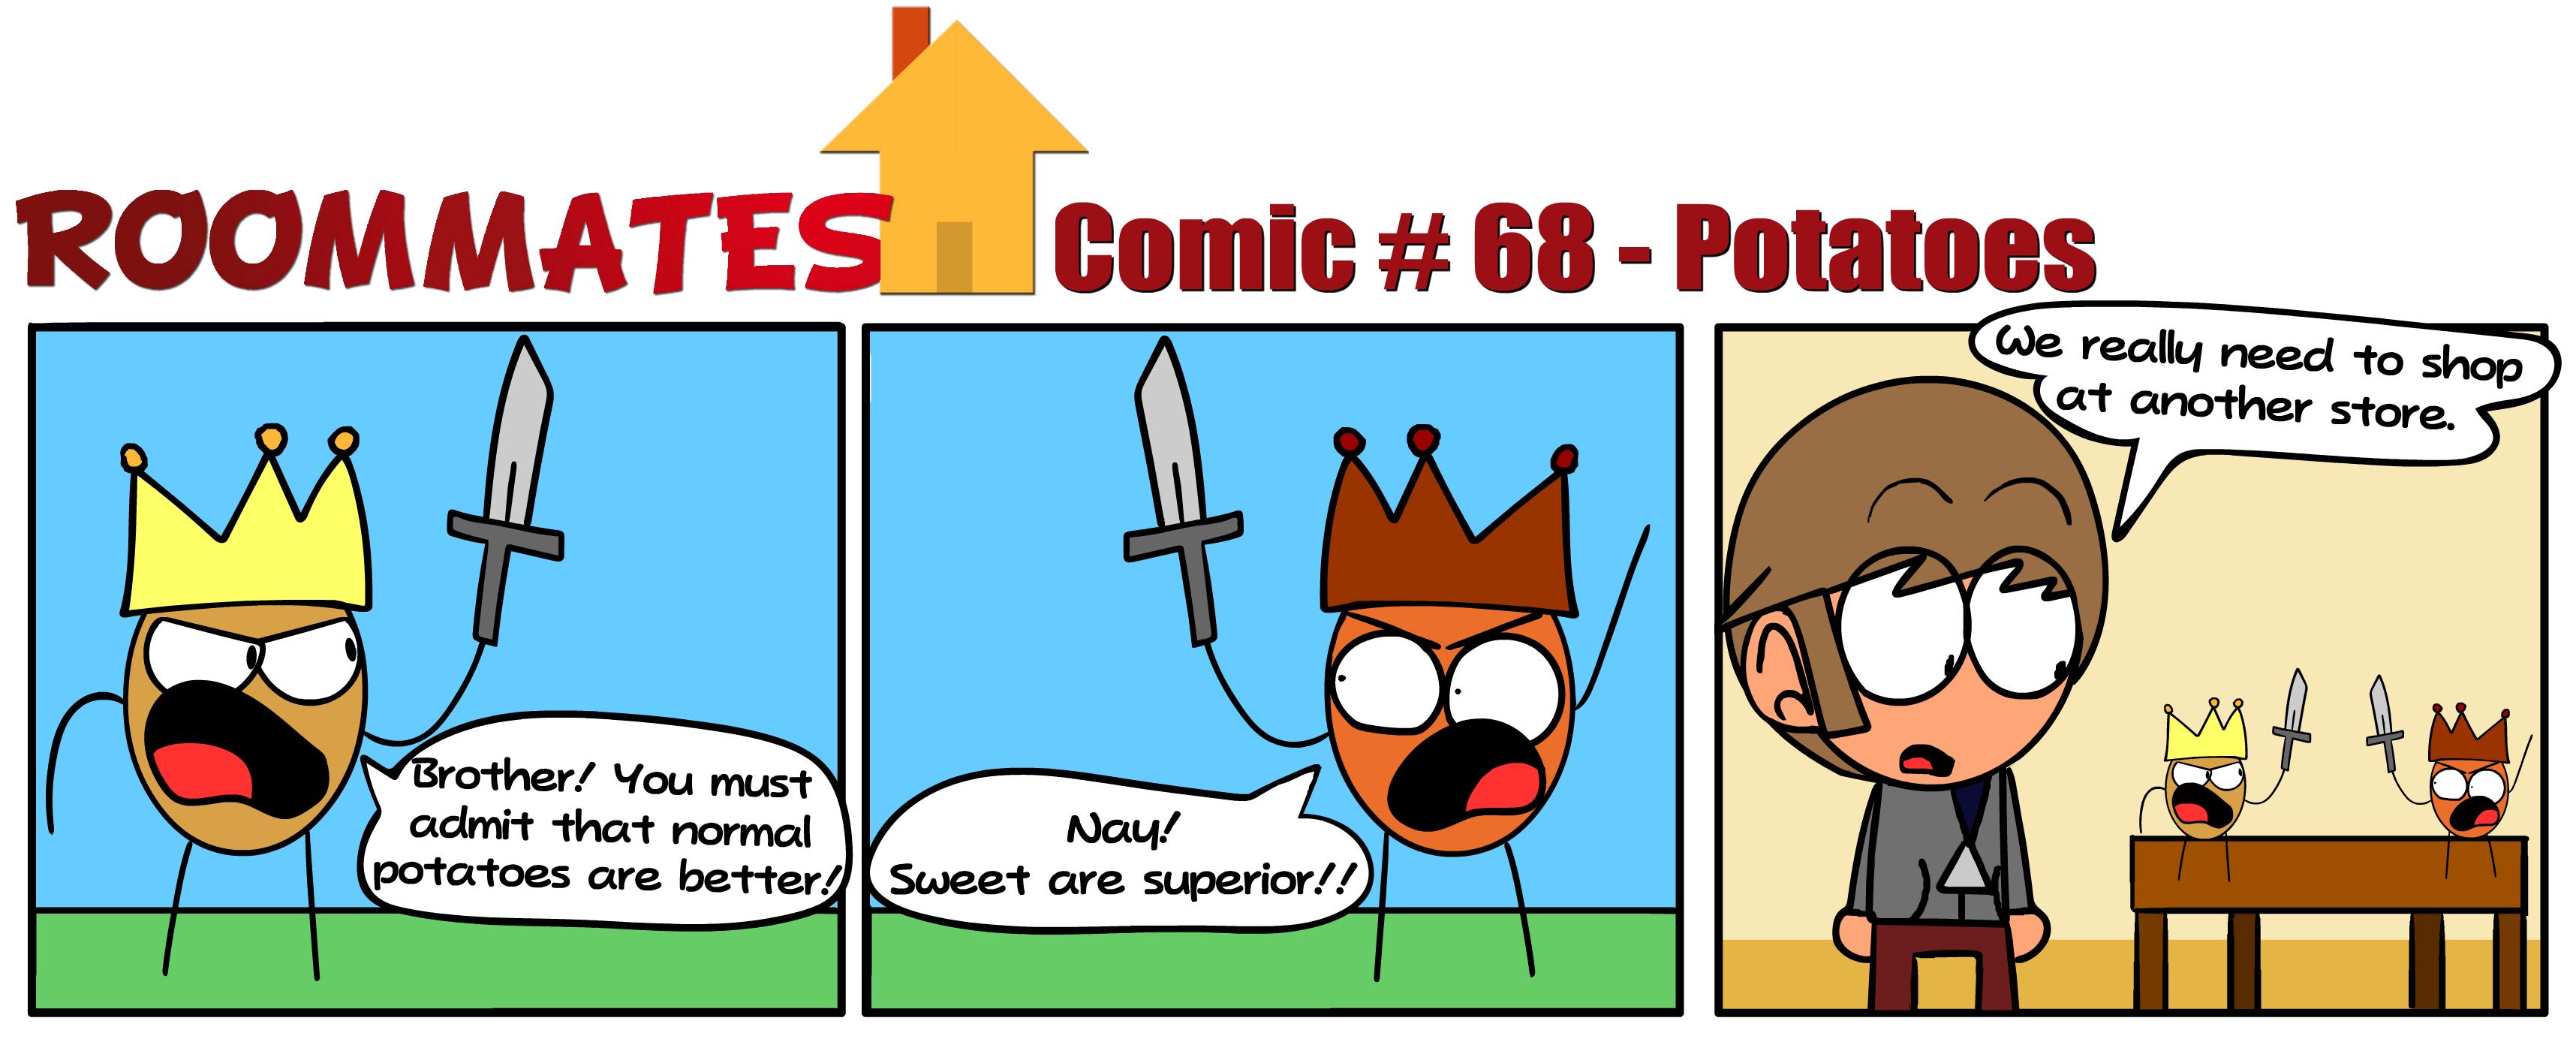 Roommates - Potatoes (Comic #68)